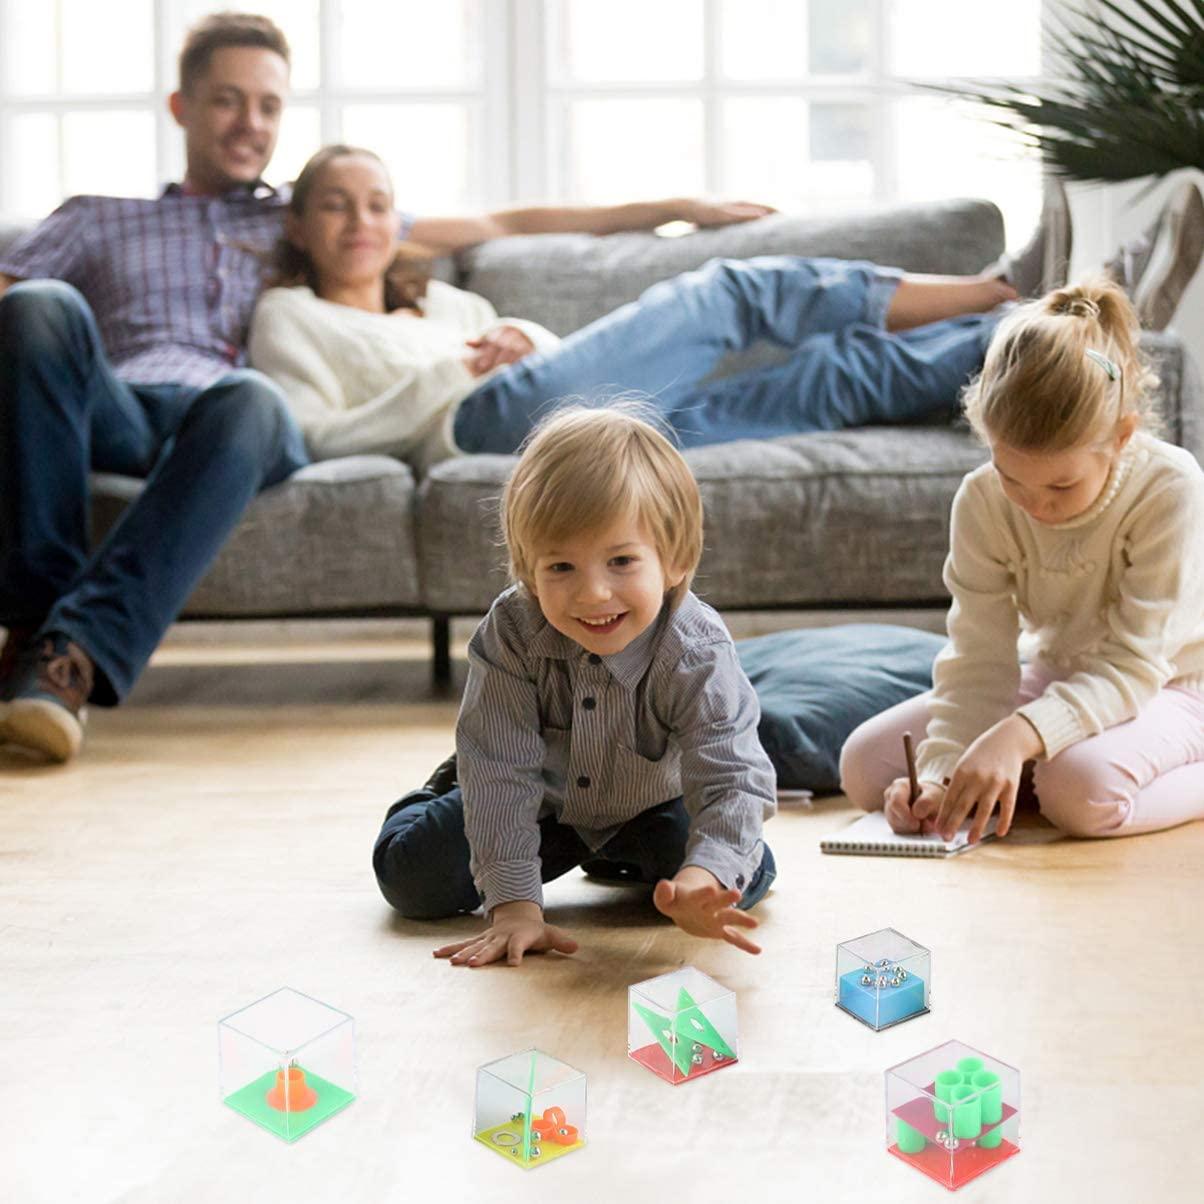 TOYANDONA Maze Puzzle Cube Set Mini Cube Puzzle Box Brain Teaser Games Educational Maze Toys for Kids Teens Party Favors